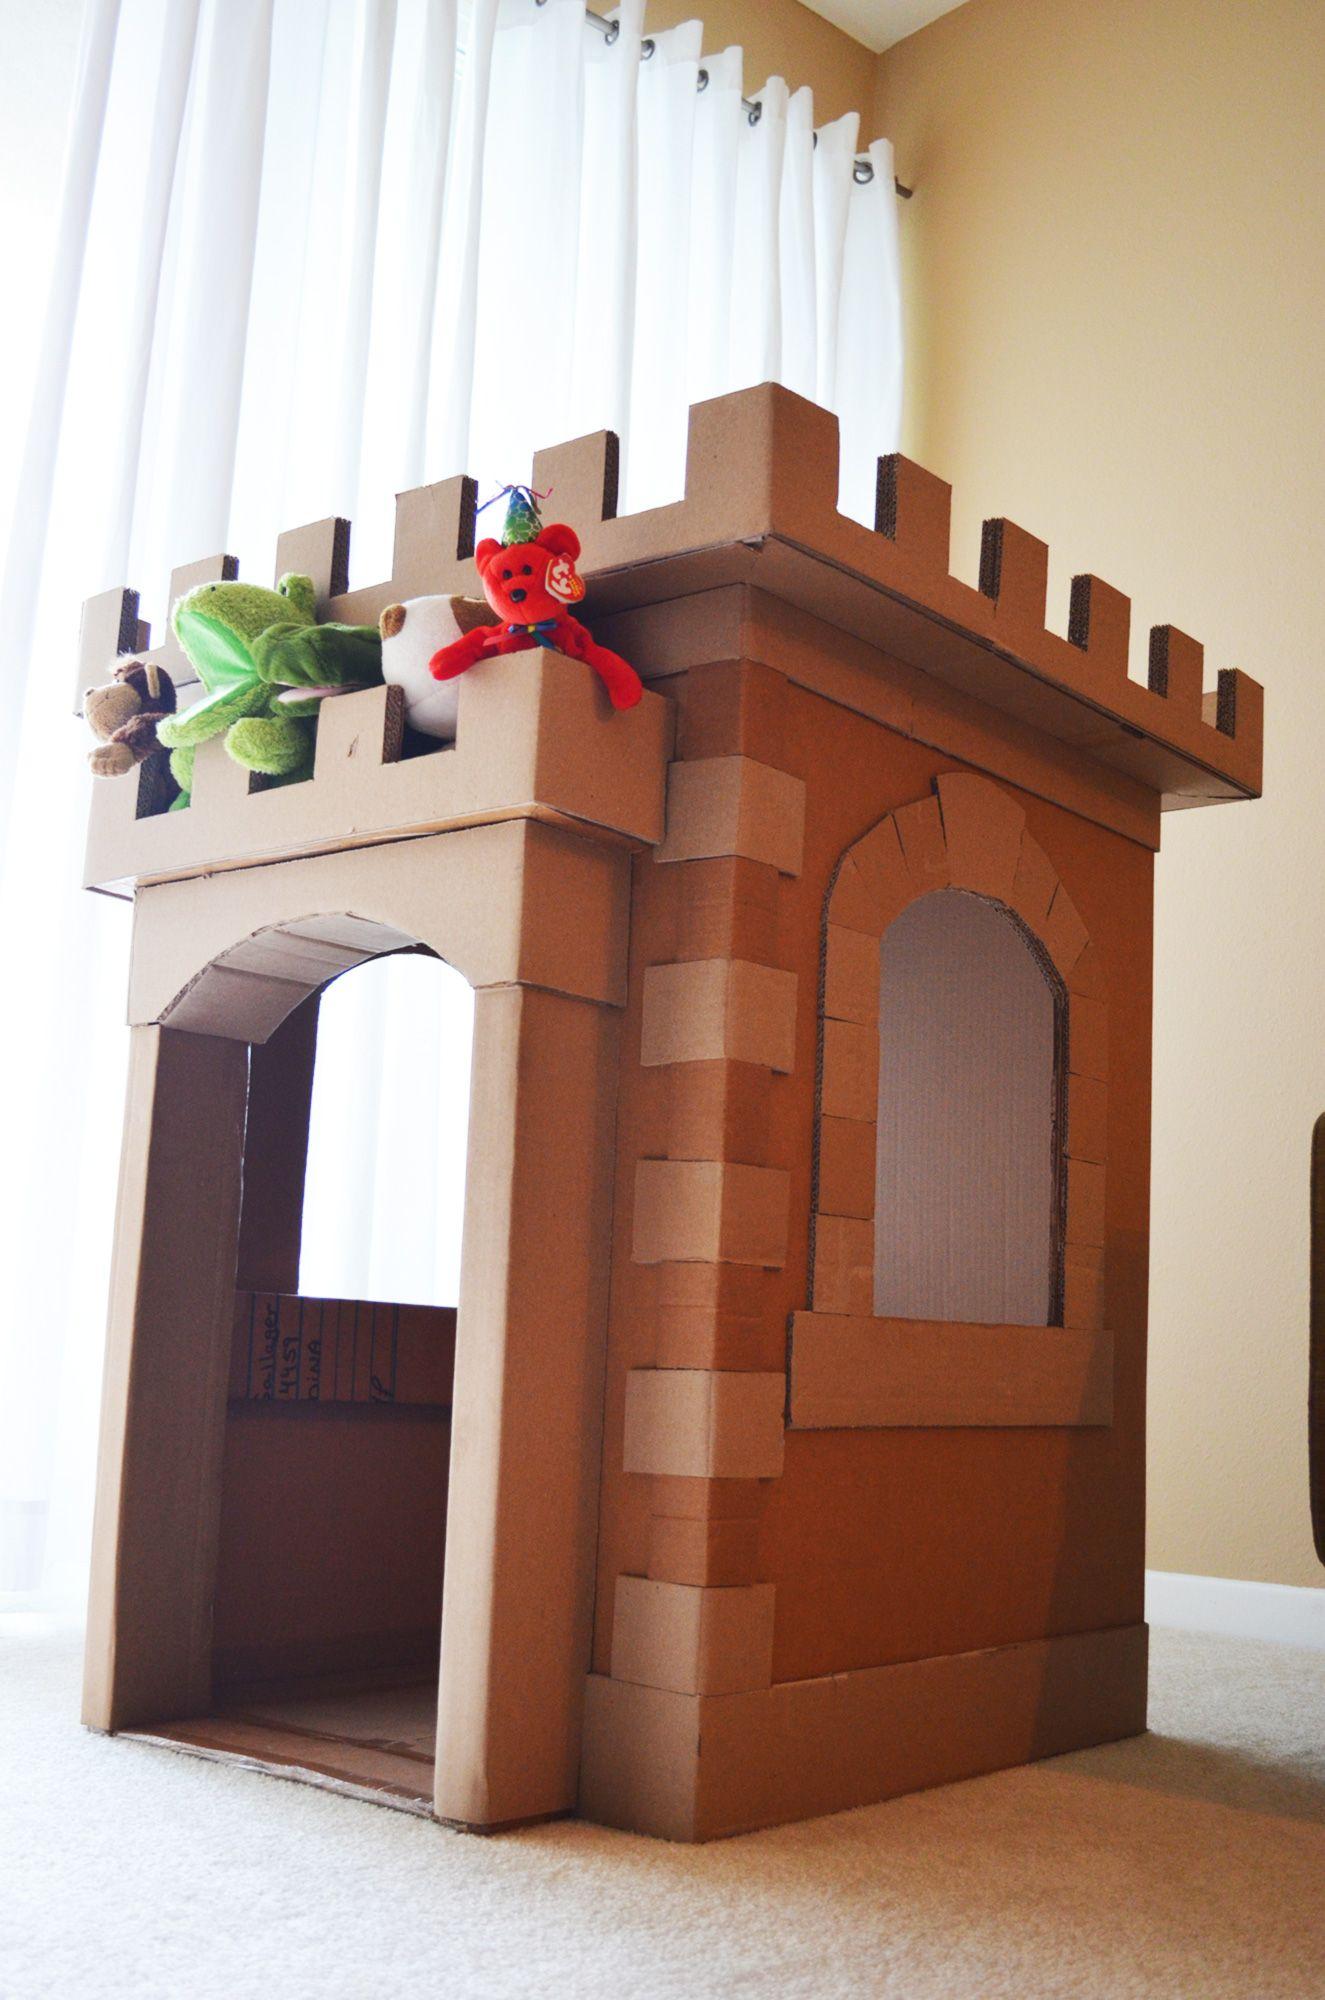 Cardboard Castle Fun Brandon Tran Cardboard Castle Kids Forts Cardboard House